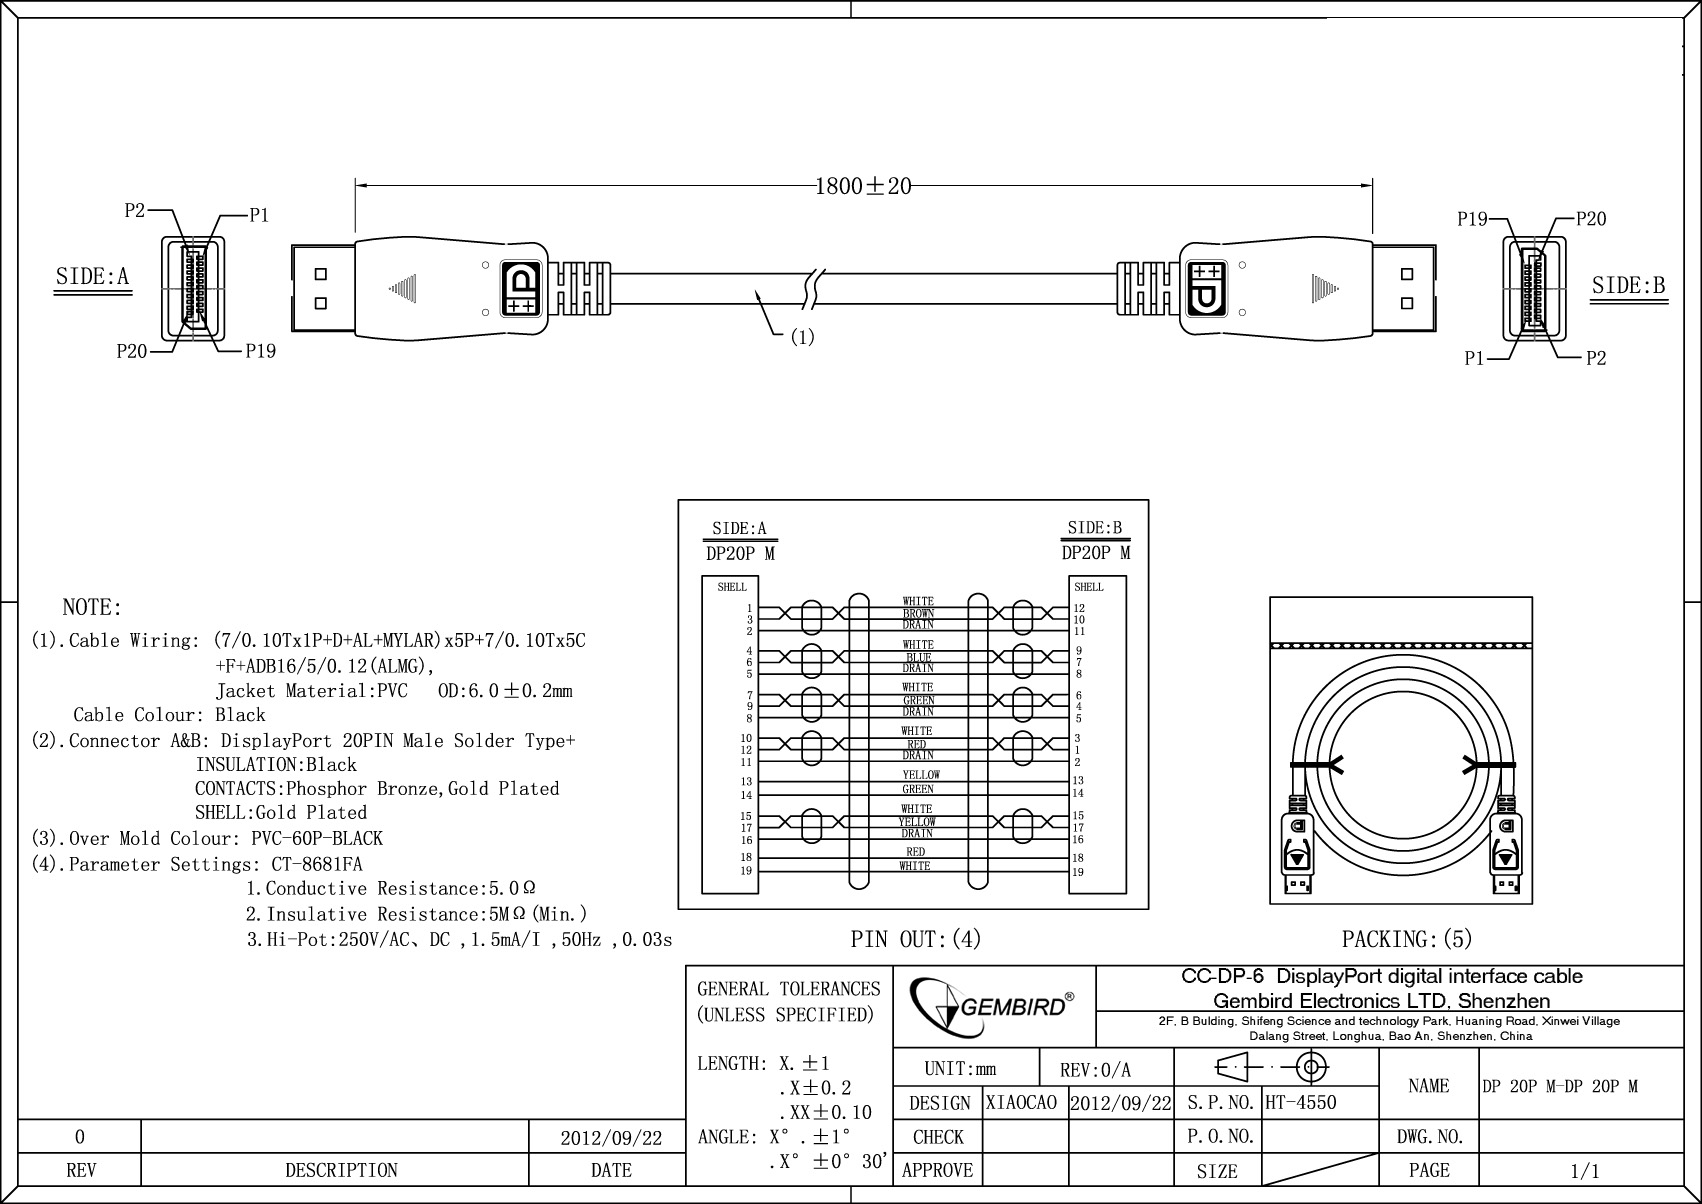 Displayport Digital Interface Cable 3 M Cc Dp 10